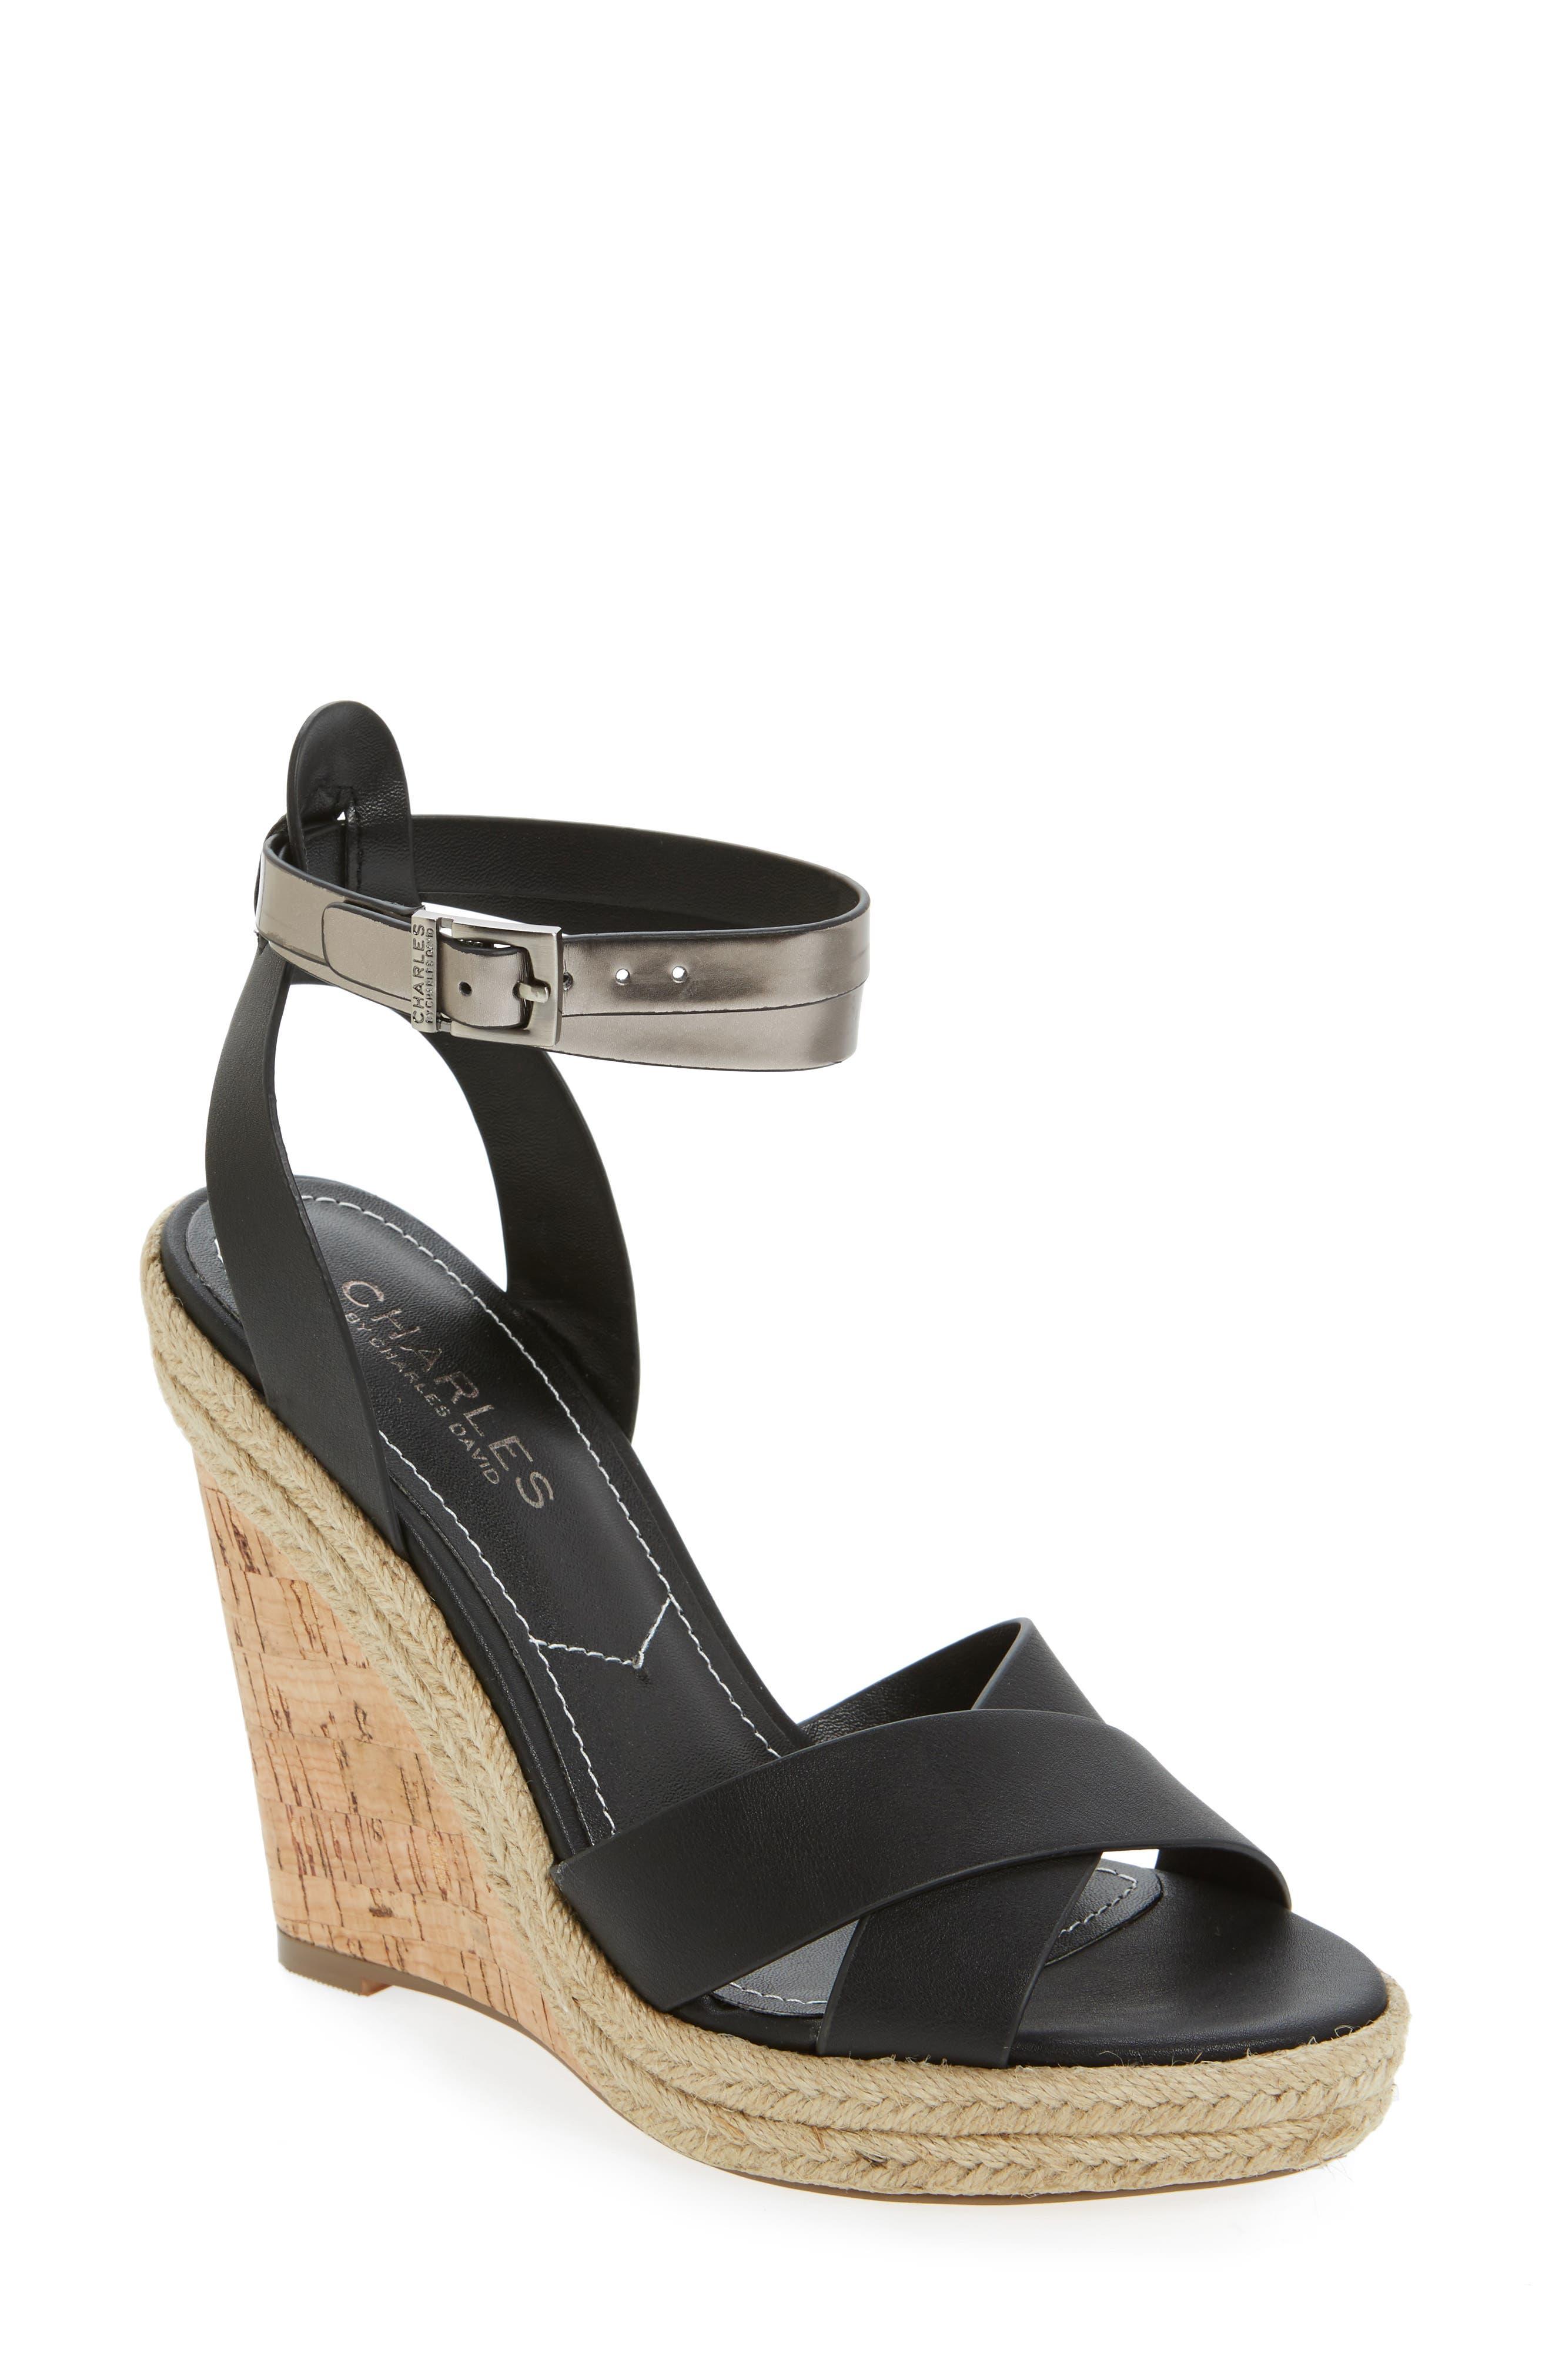 Main Image - Charles by Charles David Brit Wedge Platform Sandal (Women)